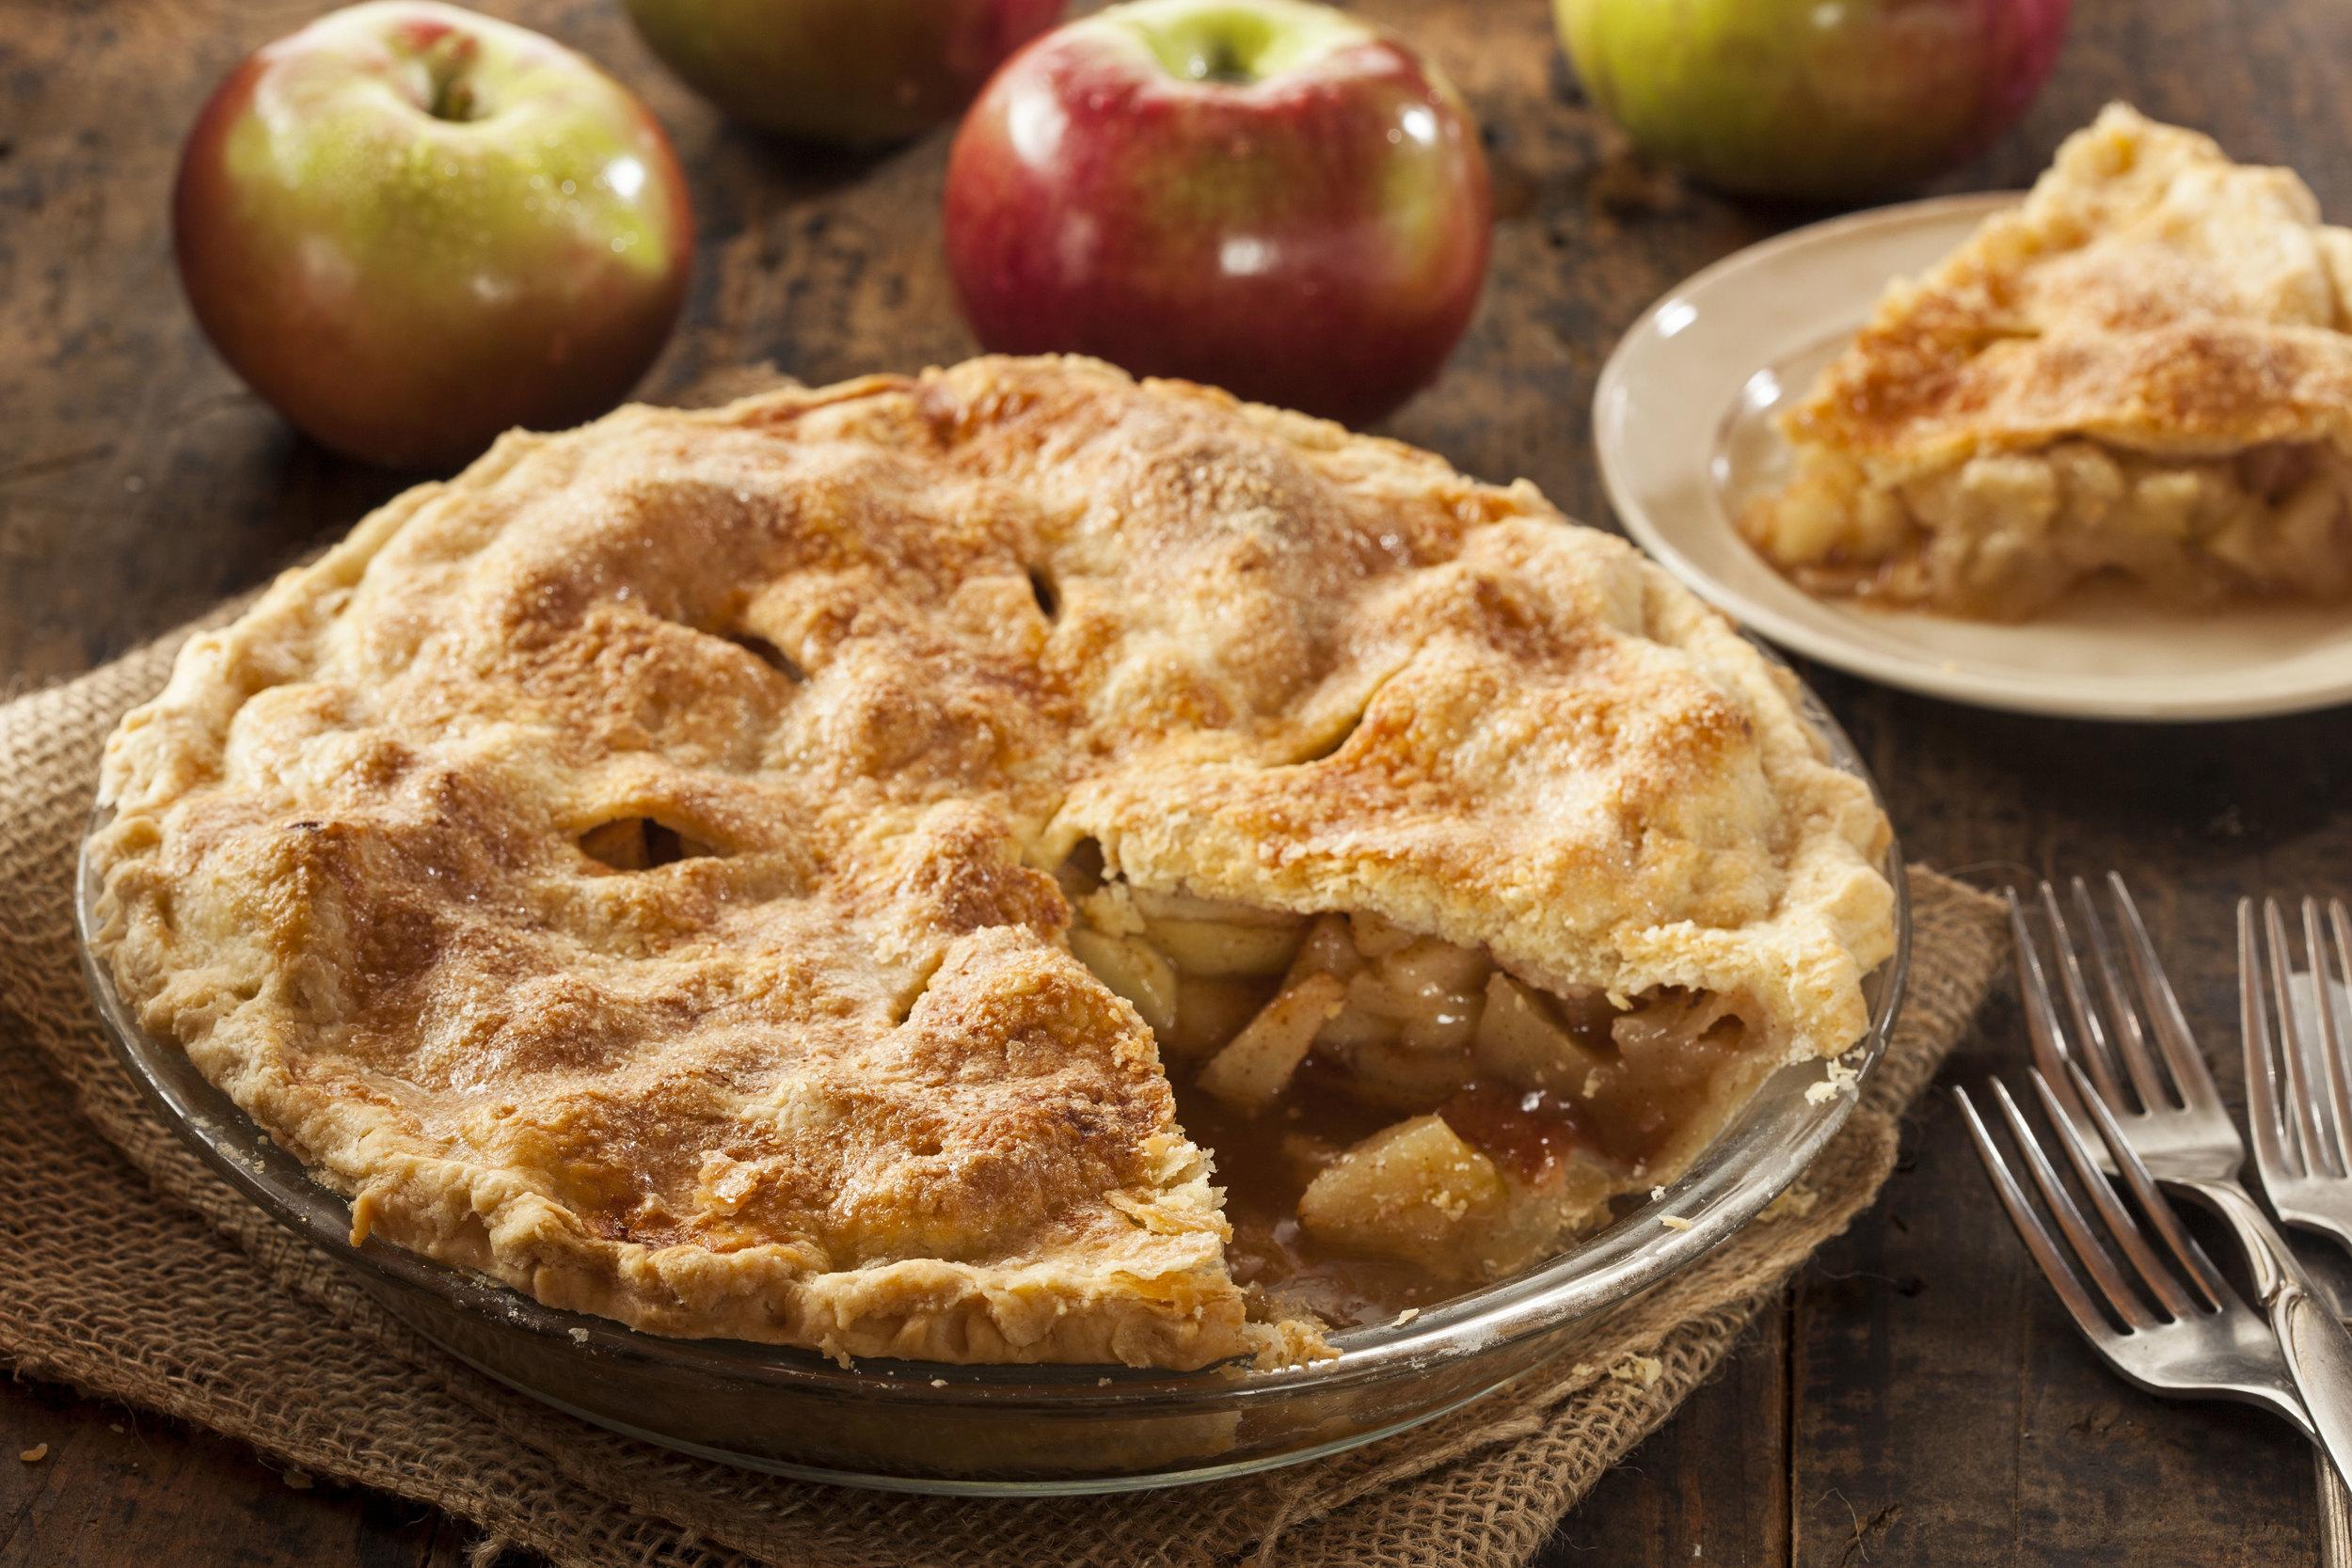 Eckert's Bakery — Eckert's Pies and Baked Goods